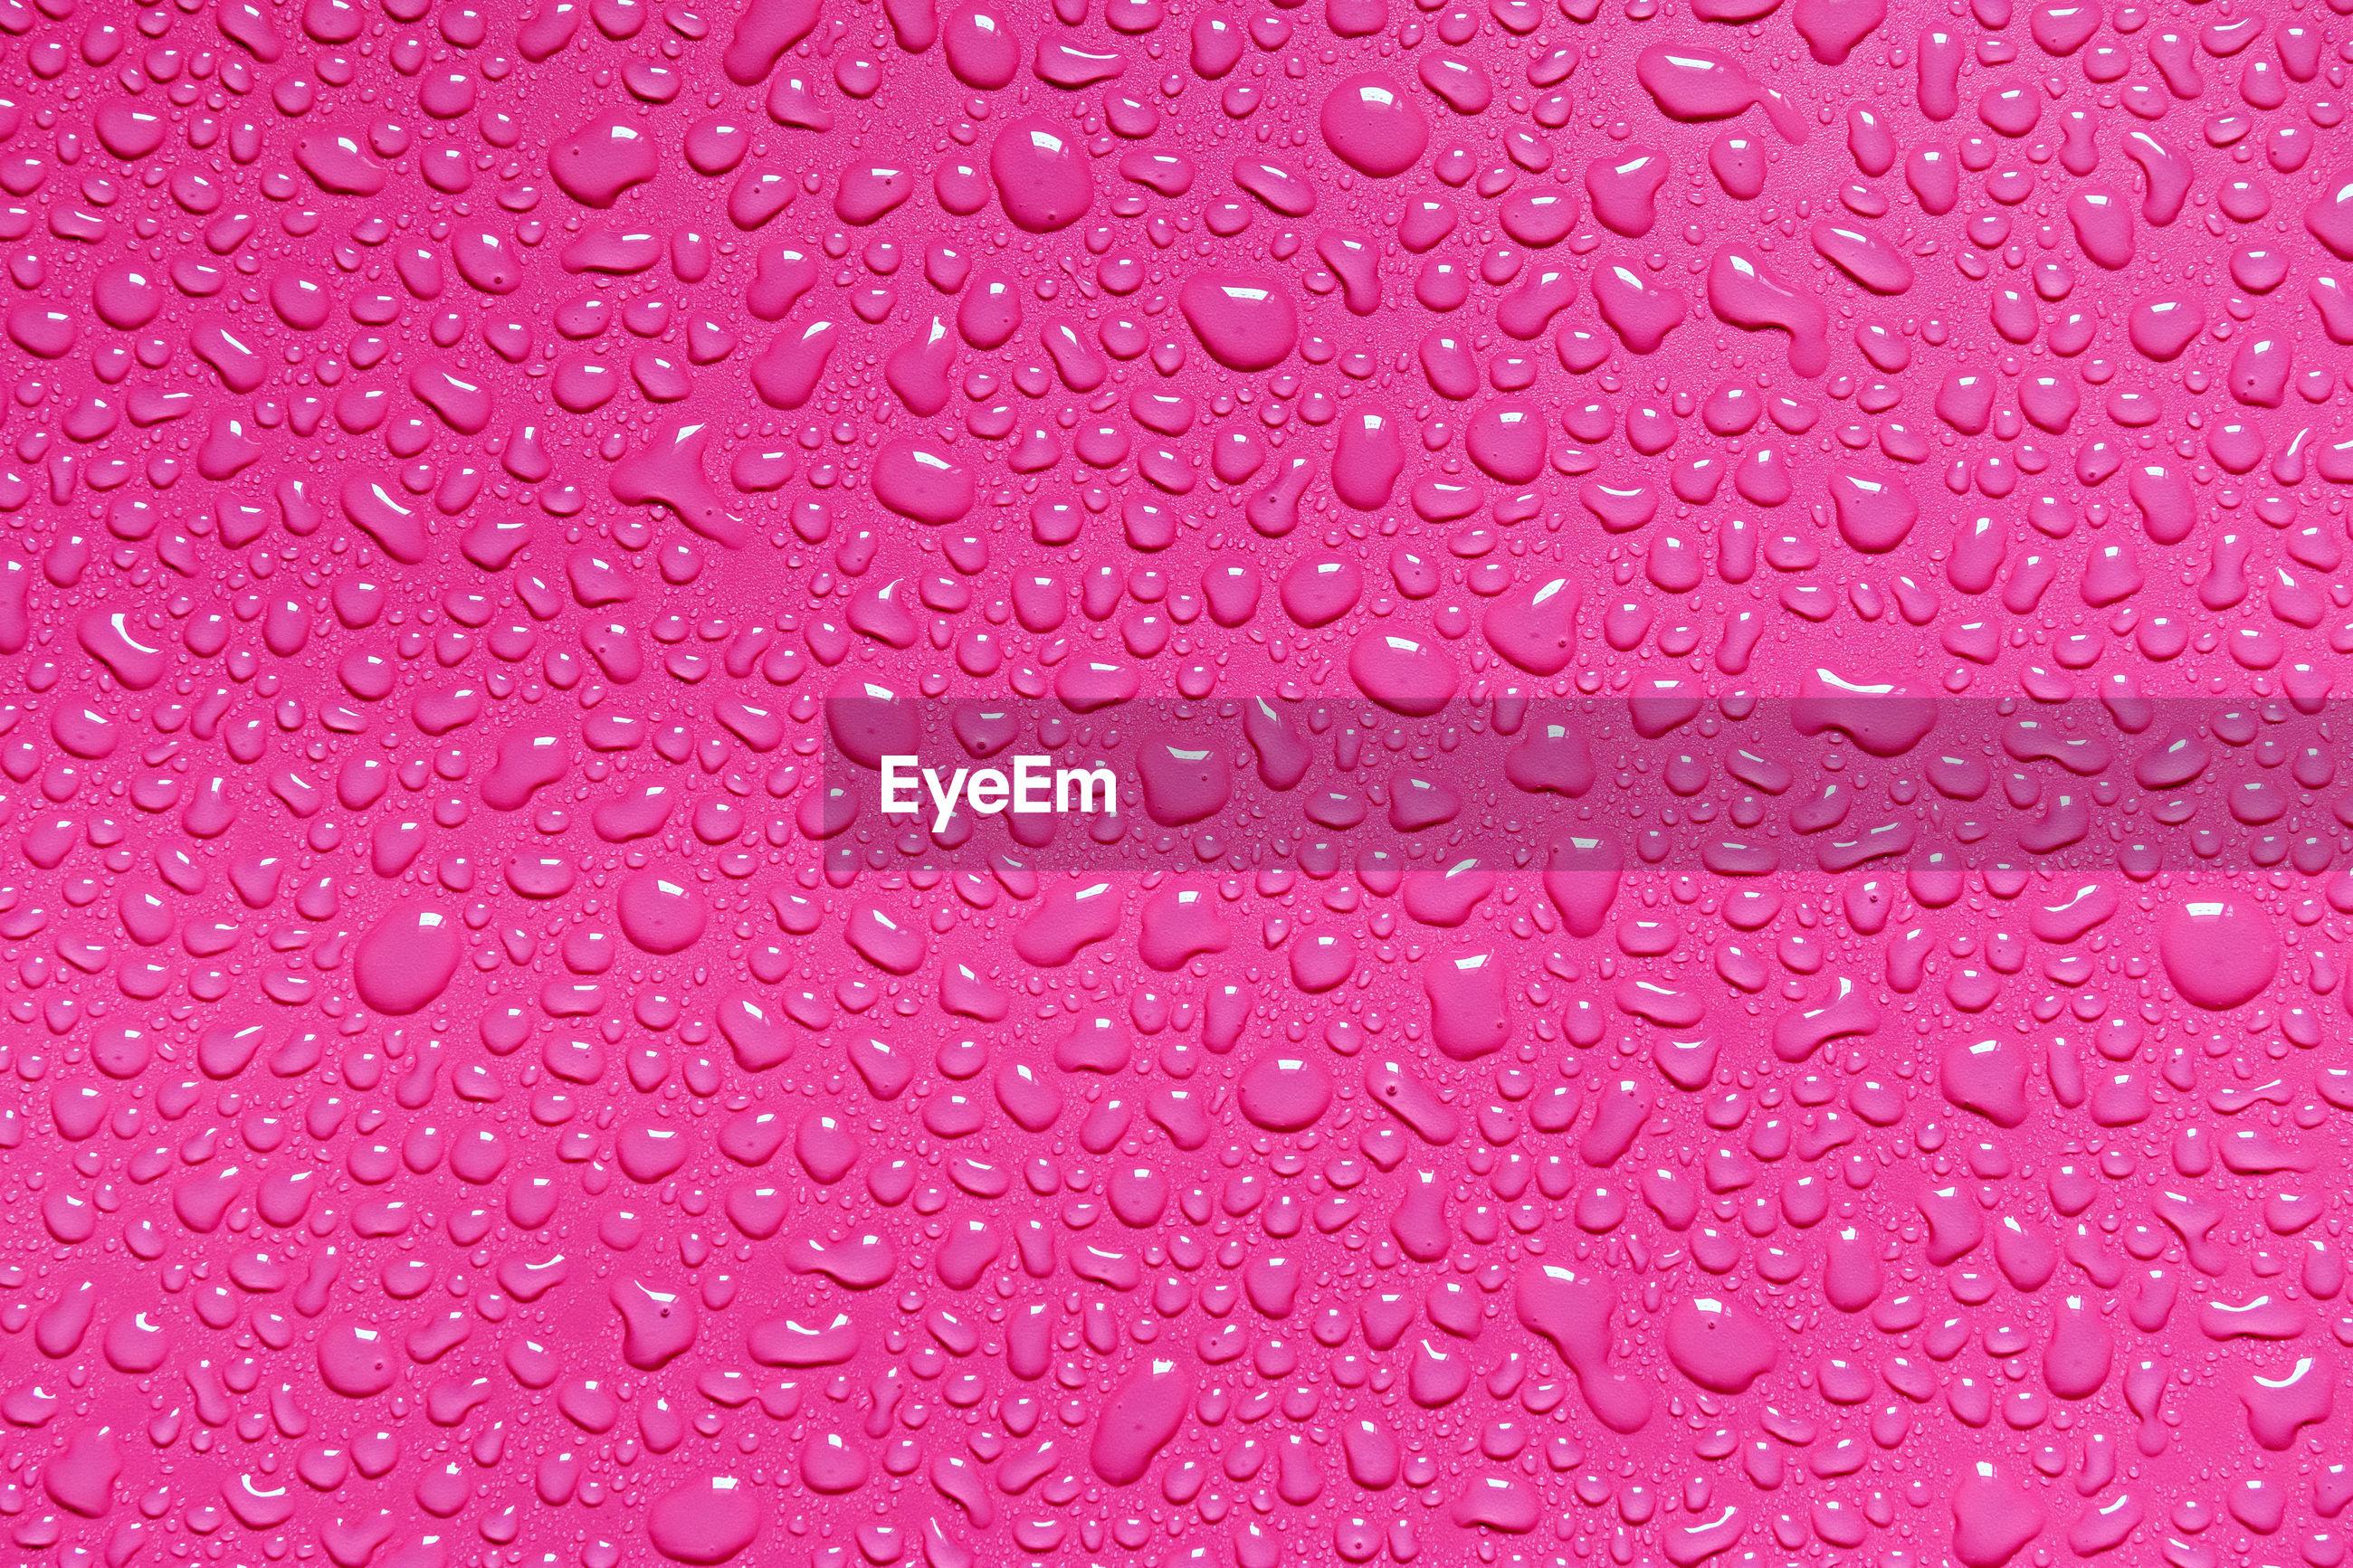 Full frame shot of raindrops on pink surface